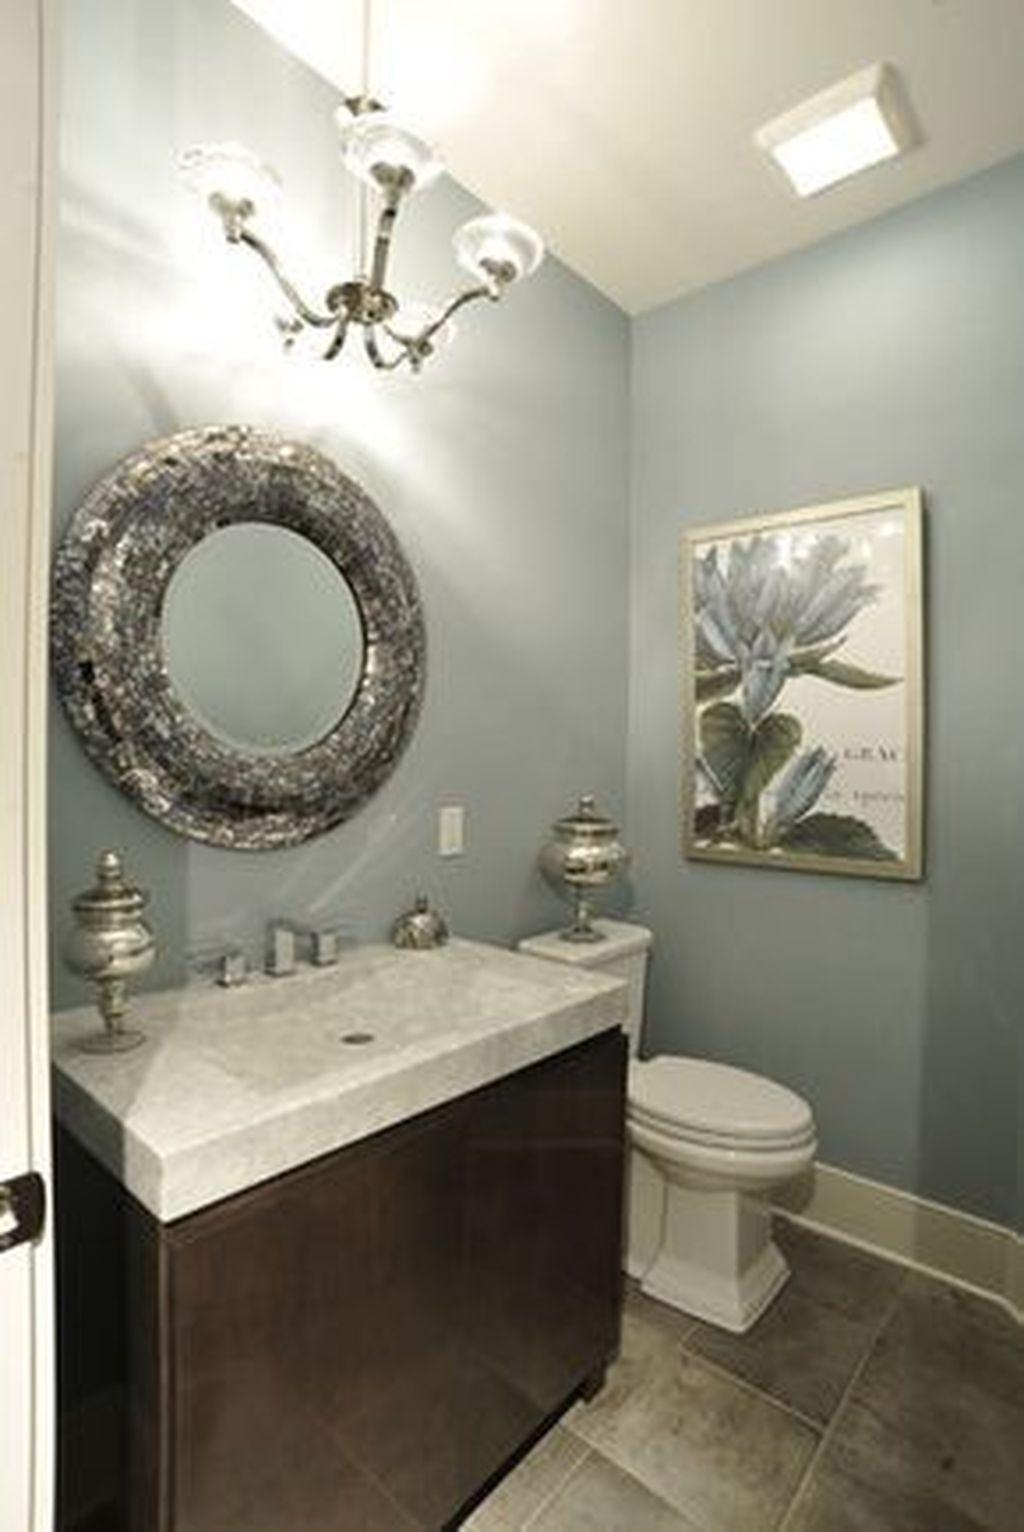 35 Cool Colorful Bathroom Ideas Small Bathroom Remodel Pictures Bathroom Remodel Pictures Bathrooms Remodel